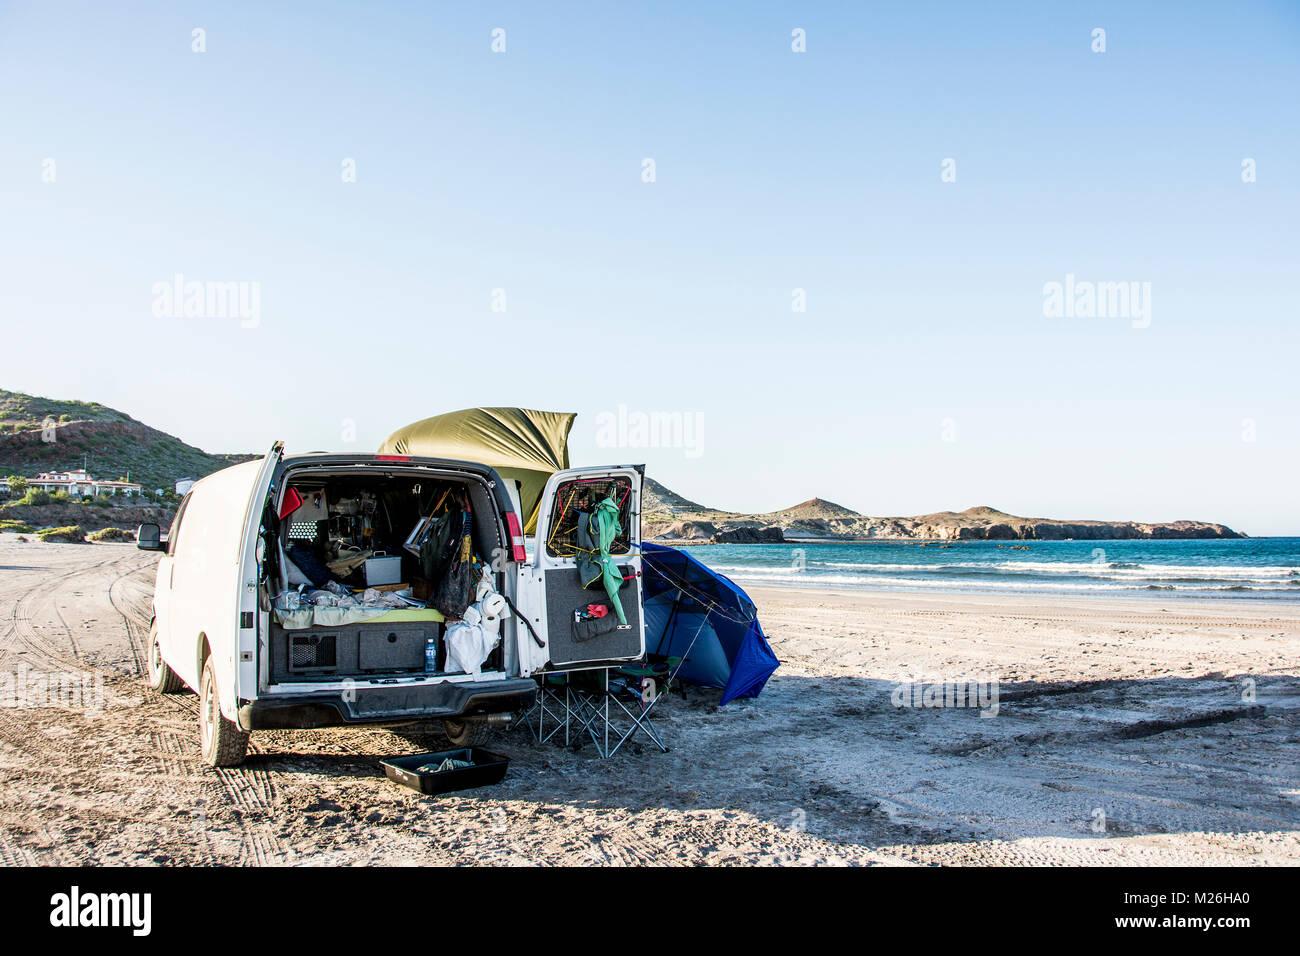 Beach camping in Punta Chivato, north of Mulege, Baja California, Mexico. Stock Photo